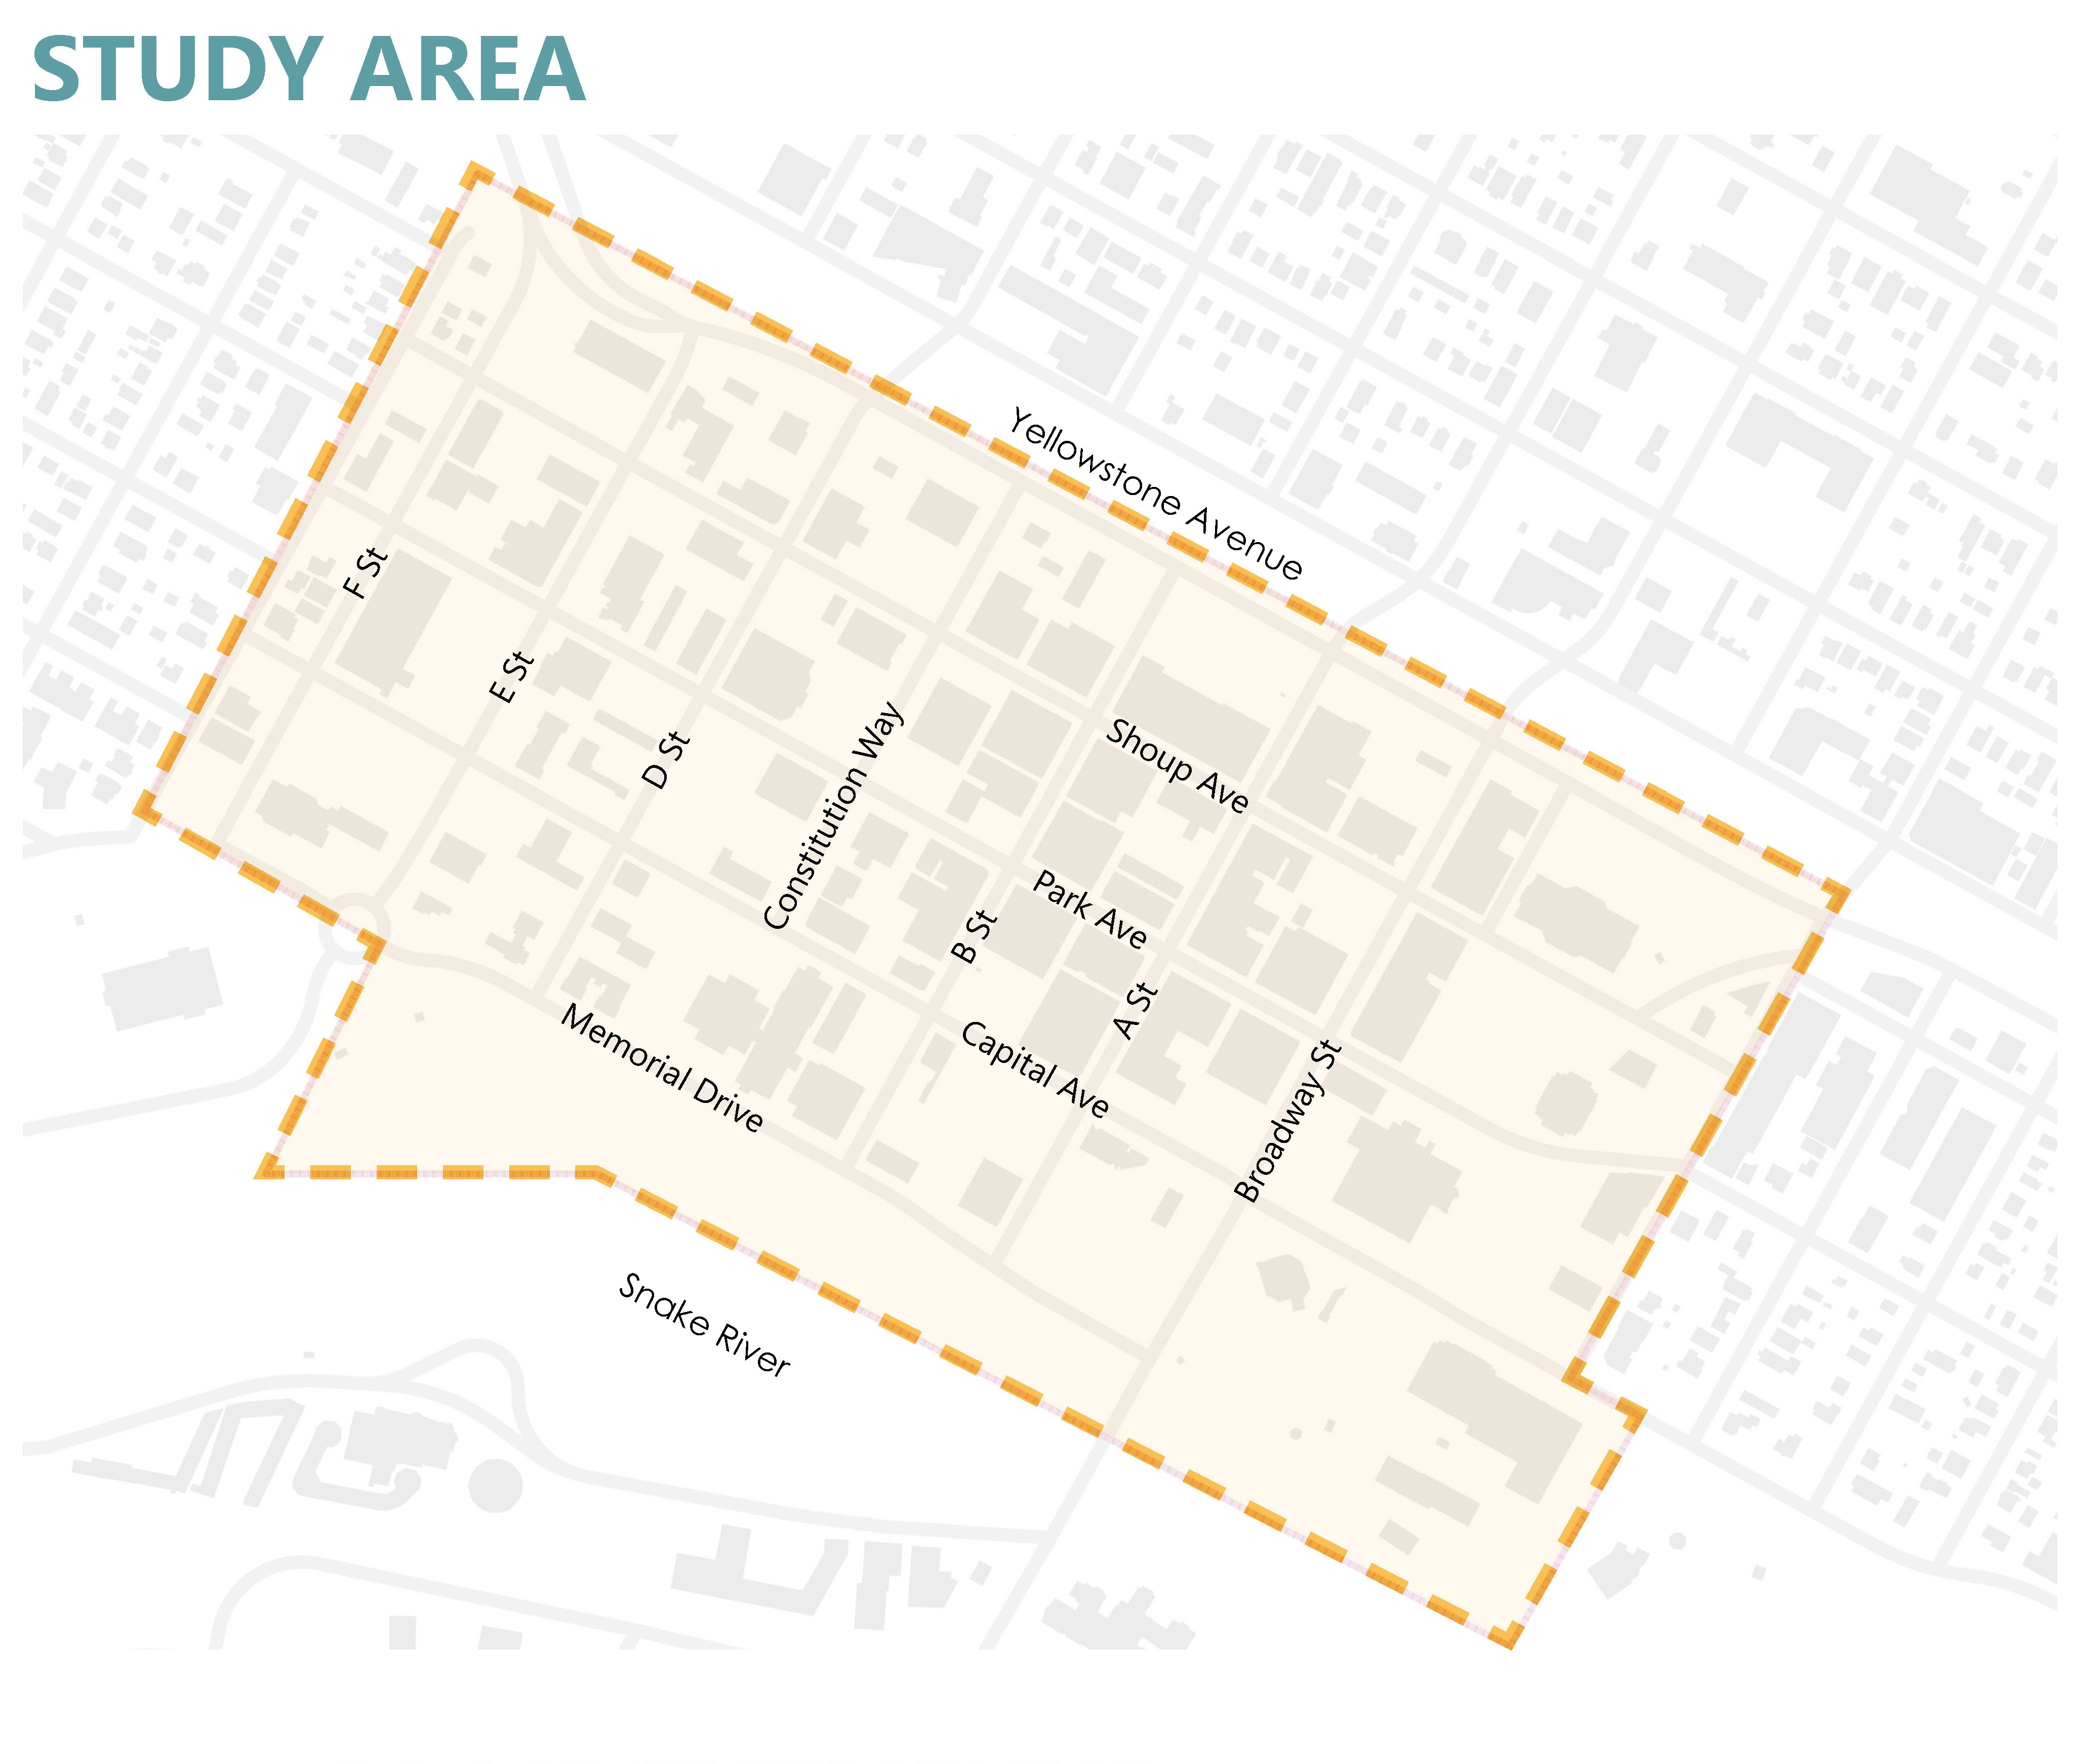 Idaho Falls Downtown Plan